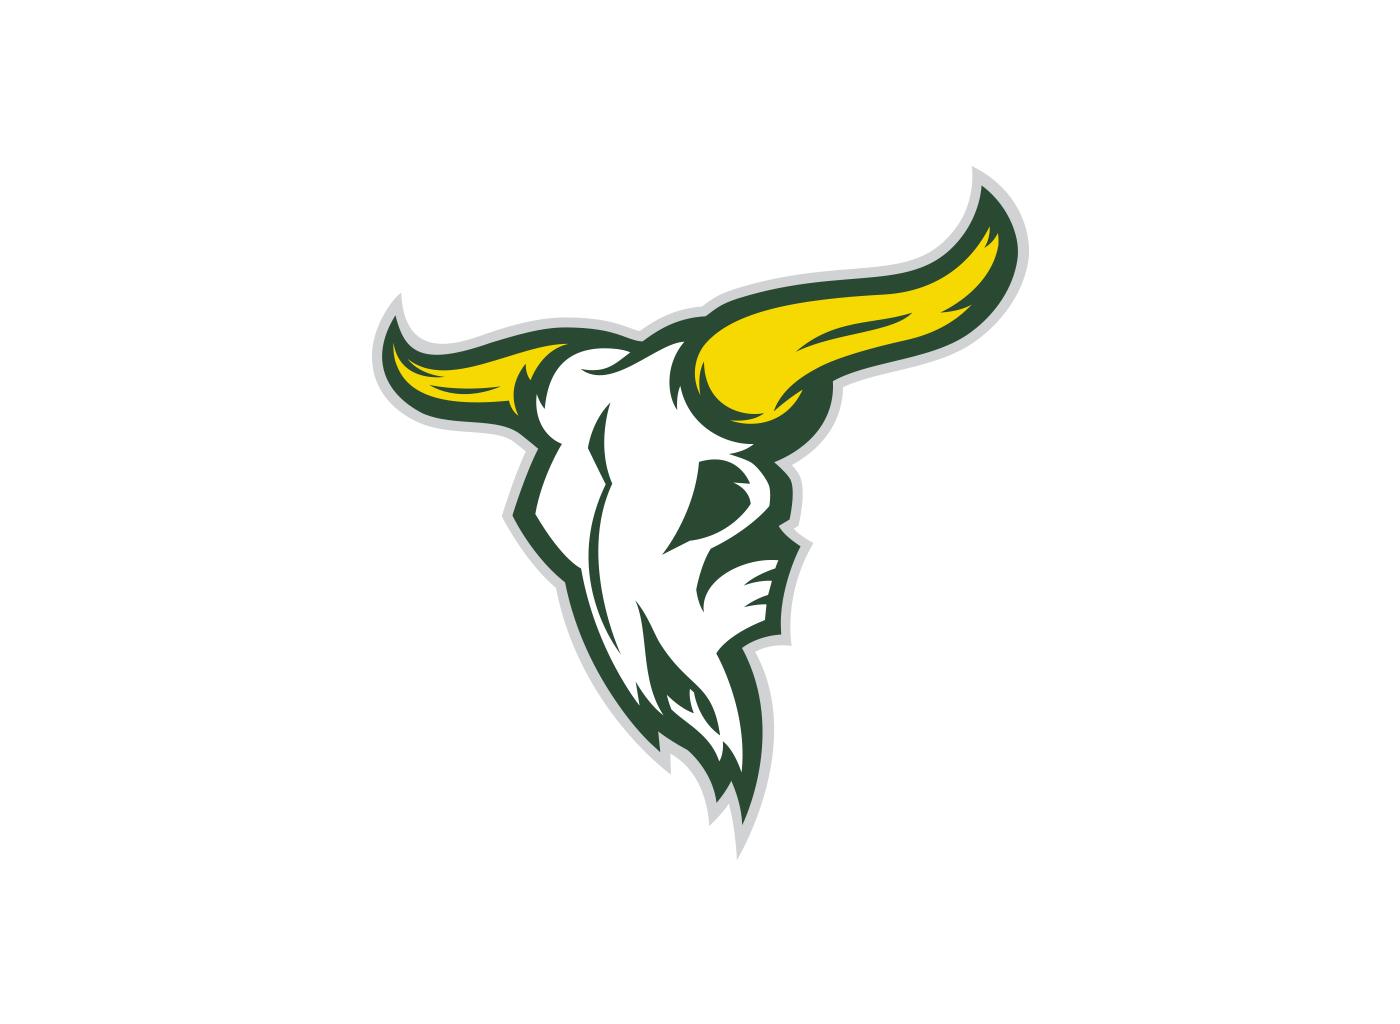 Cobra golf logo png